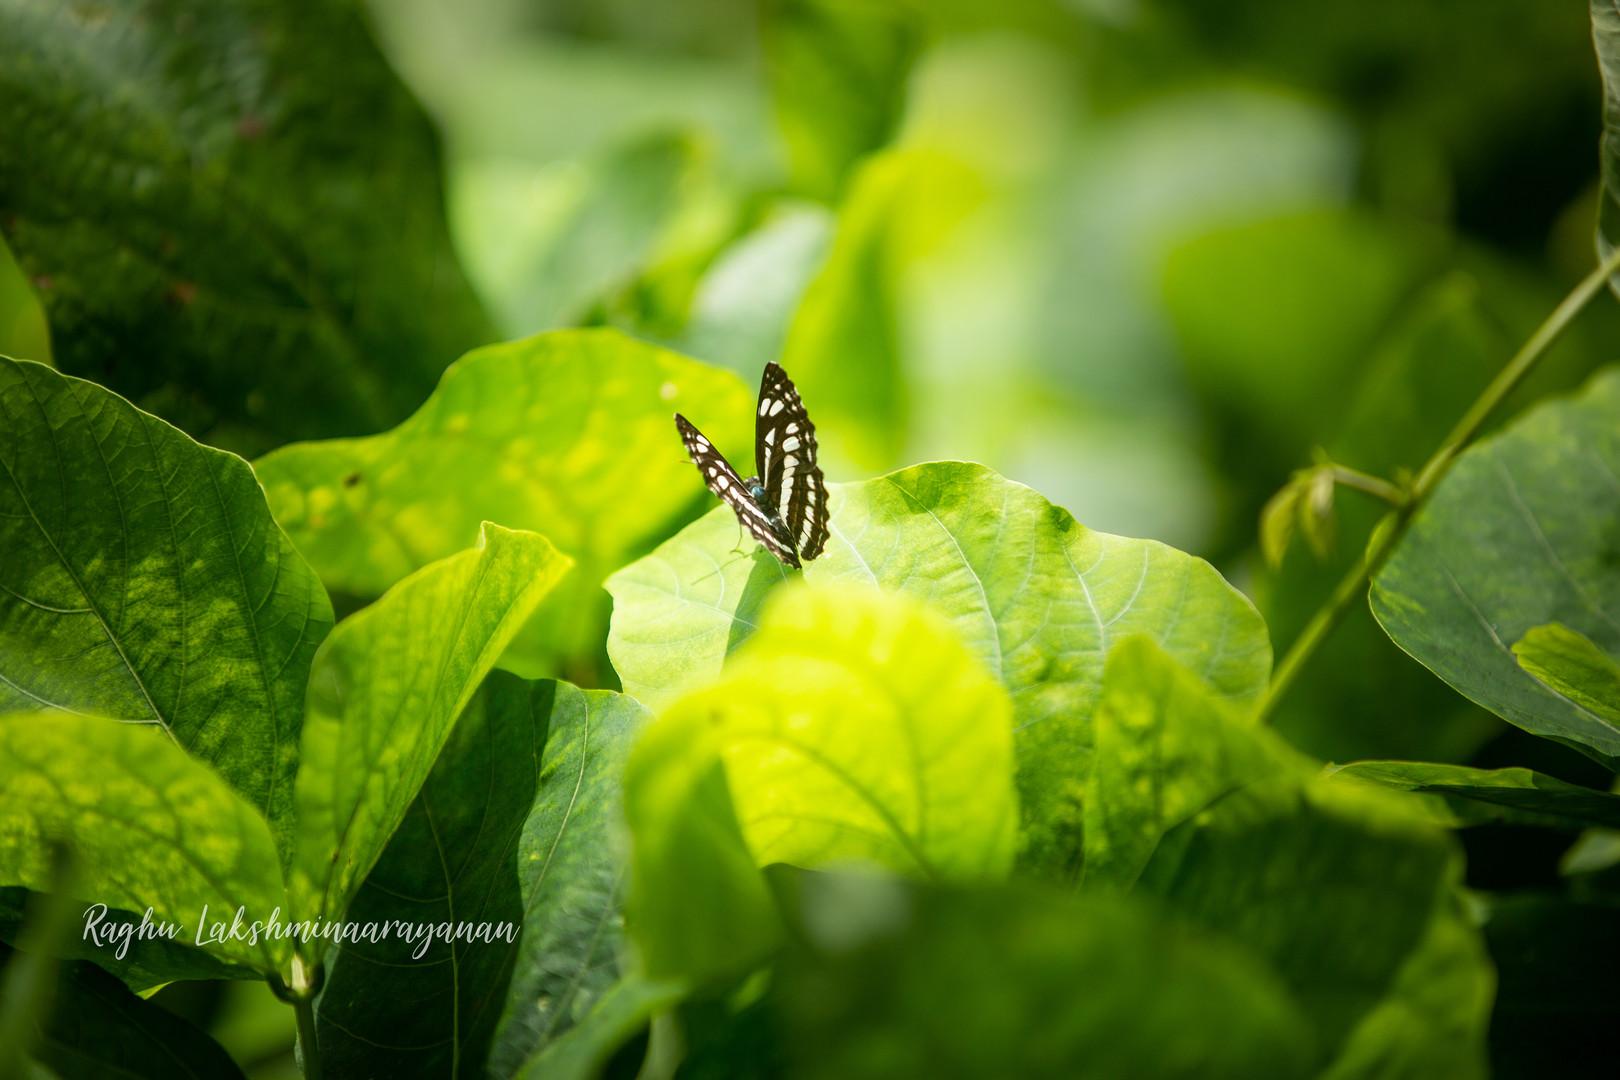 Butterfly_Allapuzha-1.jpg